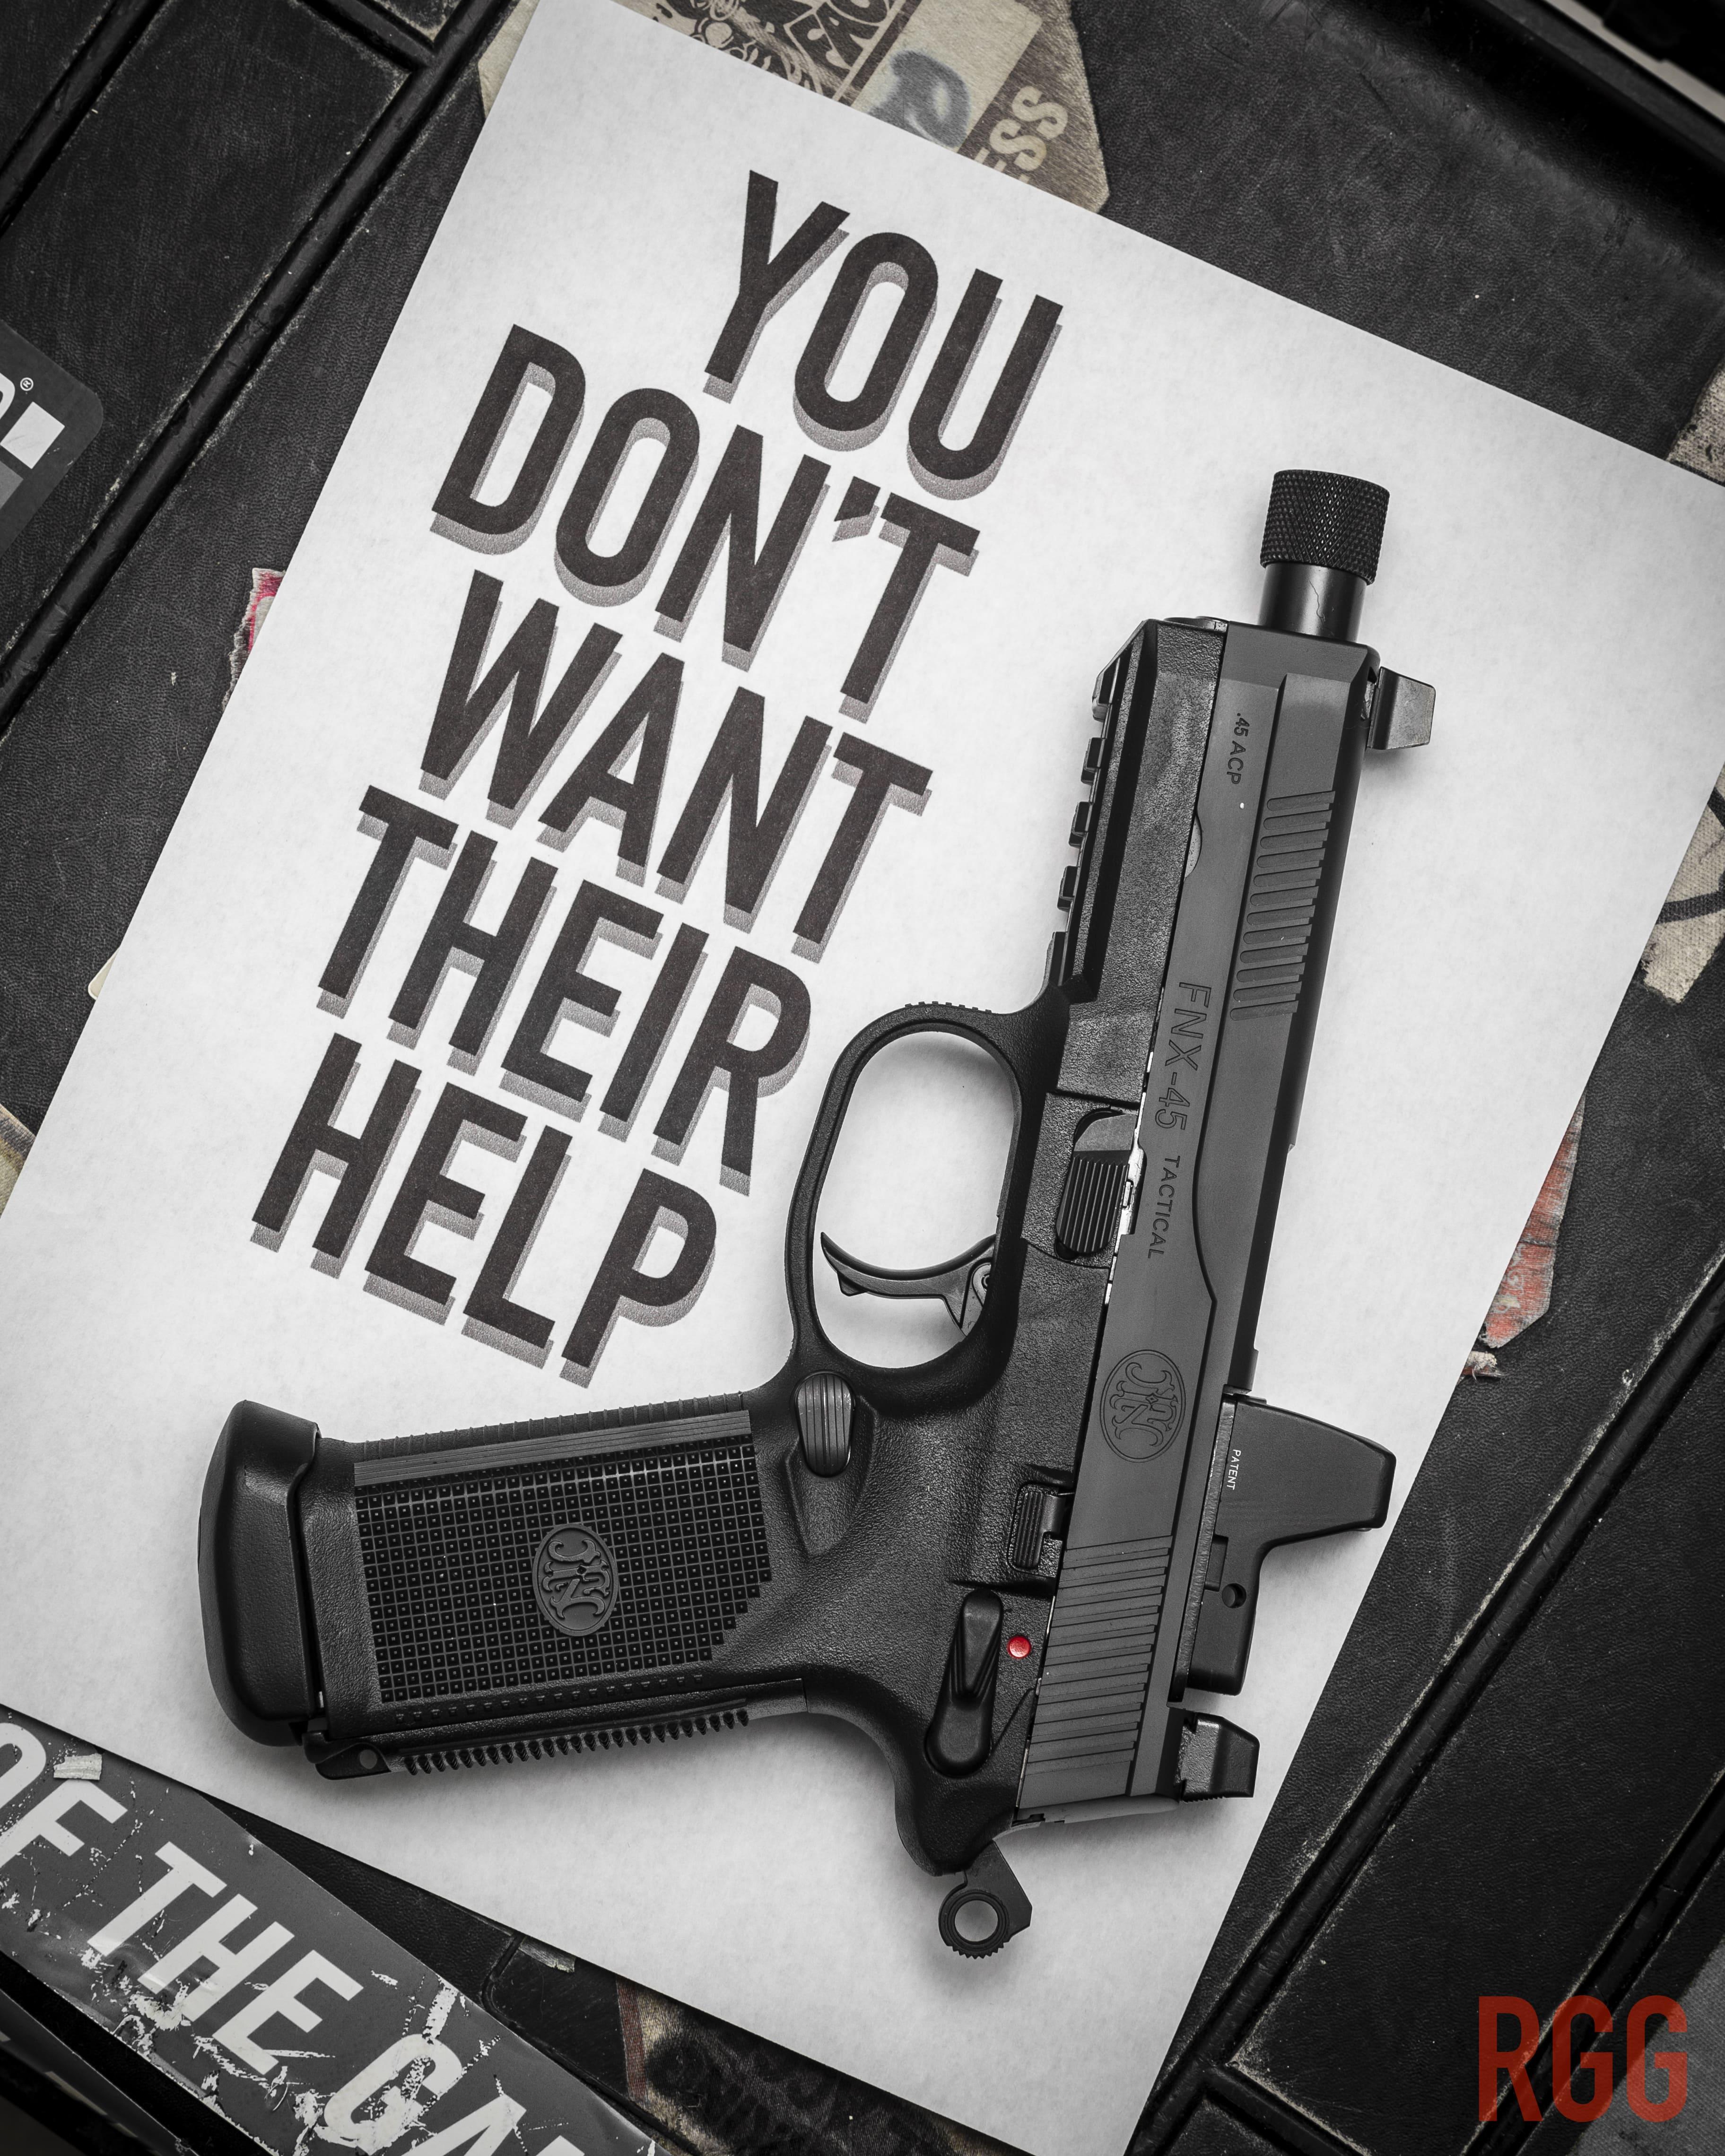 You don't want their help - bring an FNX-45 instead.